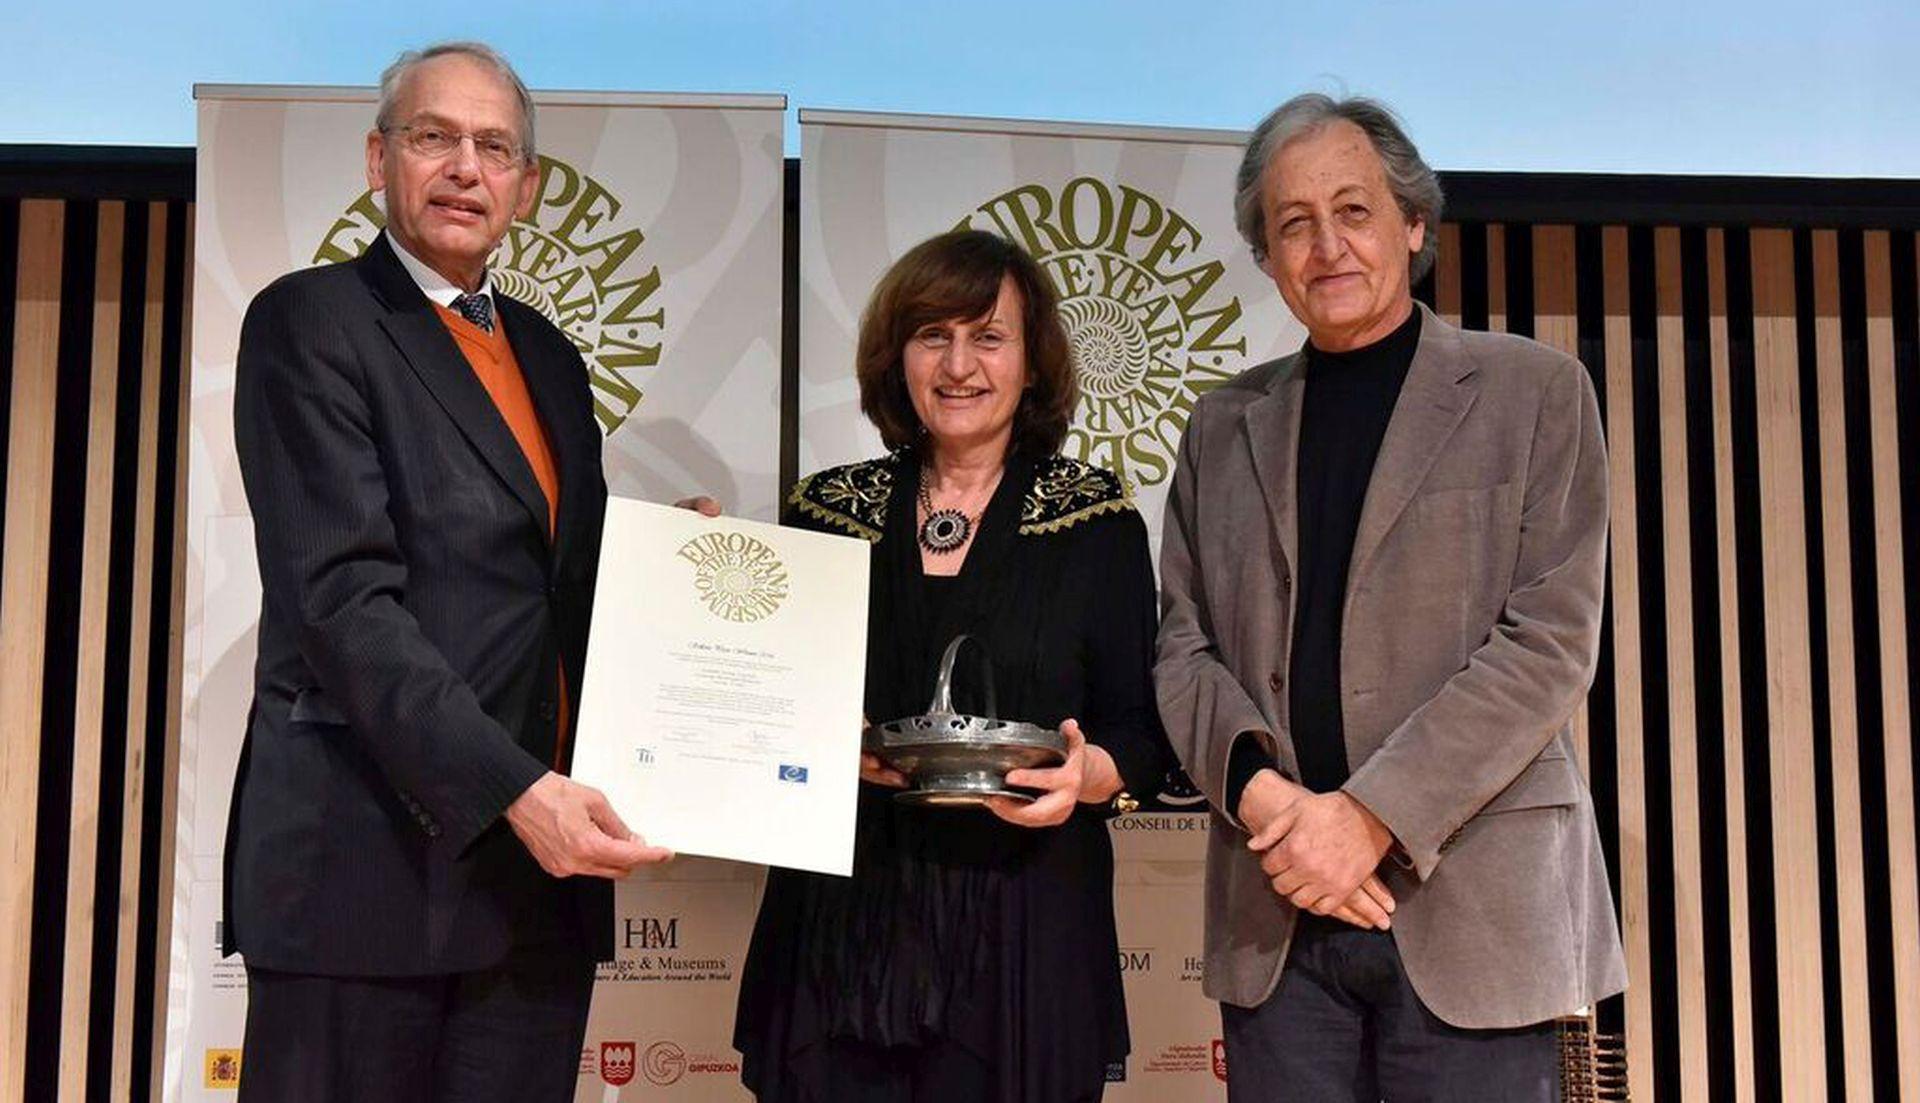 Ravnateljica Gradskog muzeja Vukovar: Izuzetno smo ponosni na nagradu Silletto